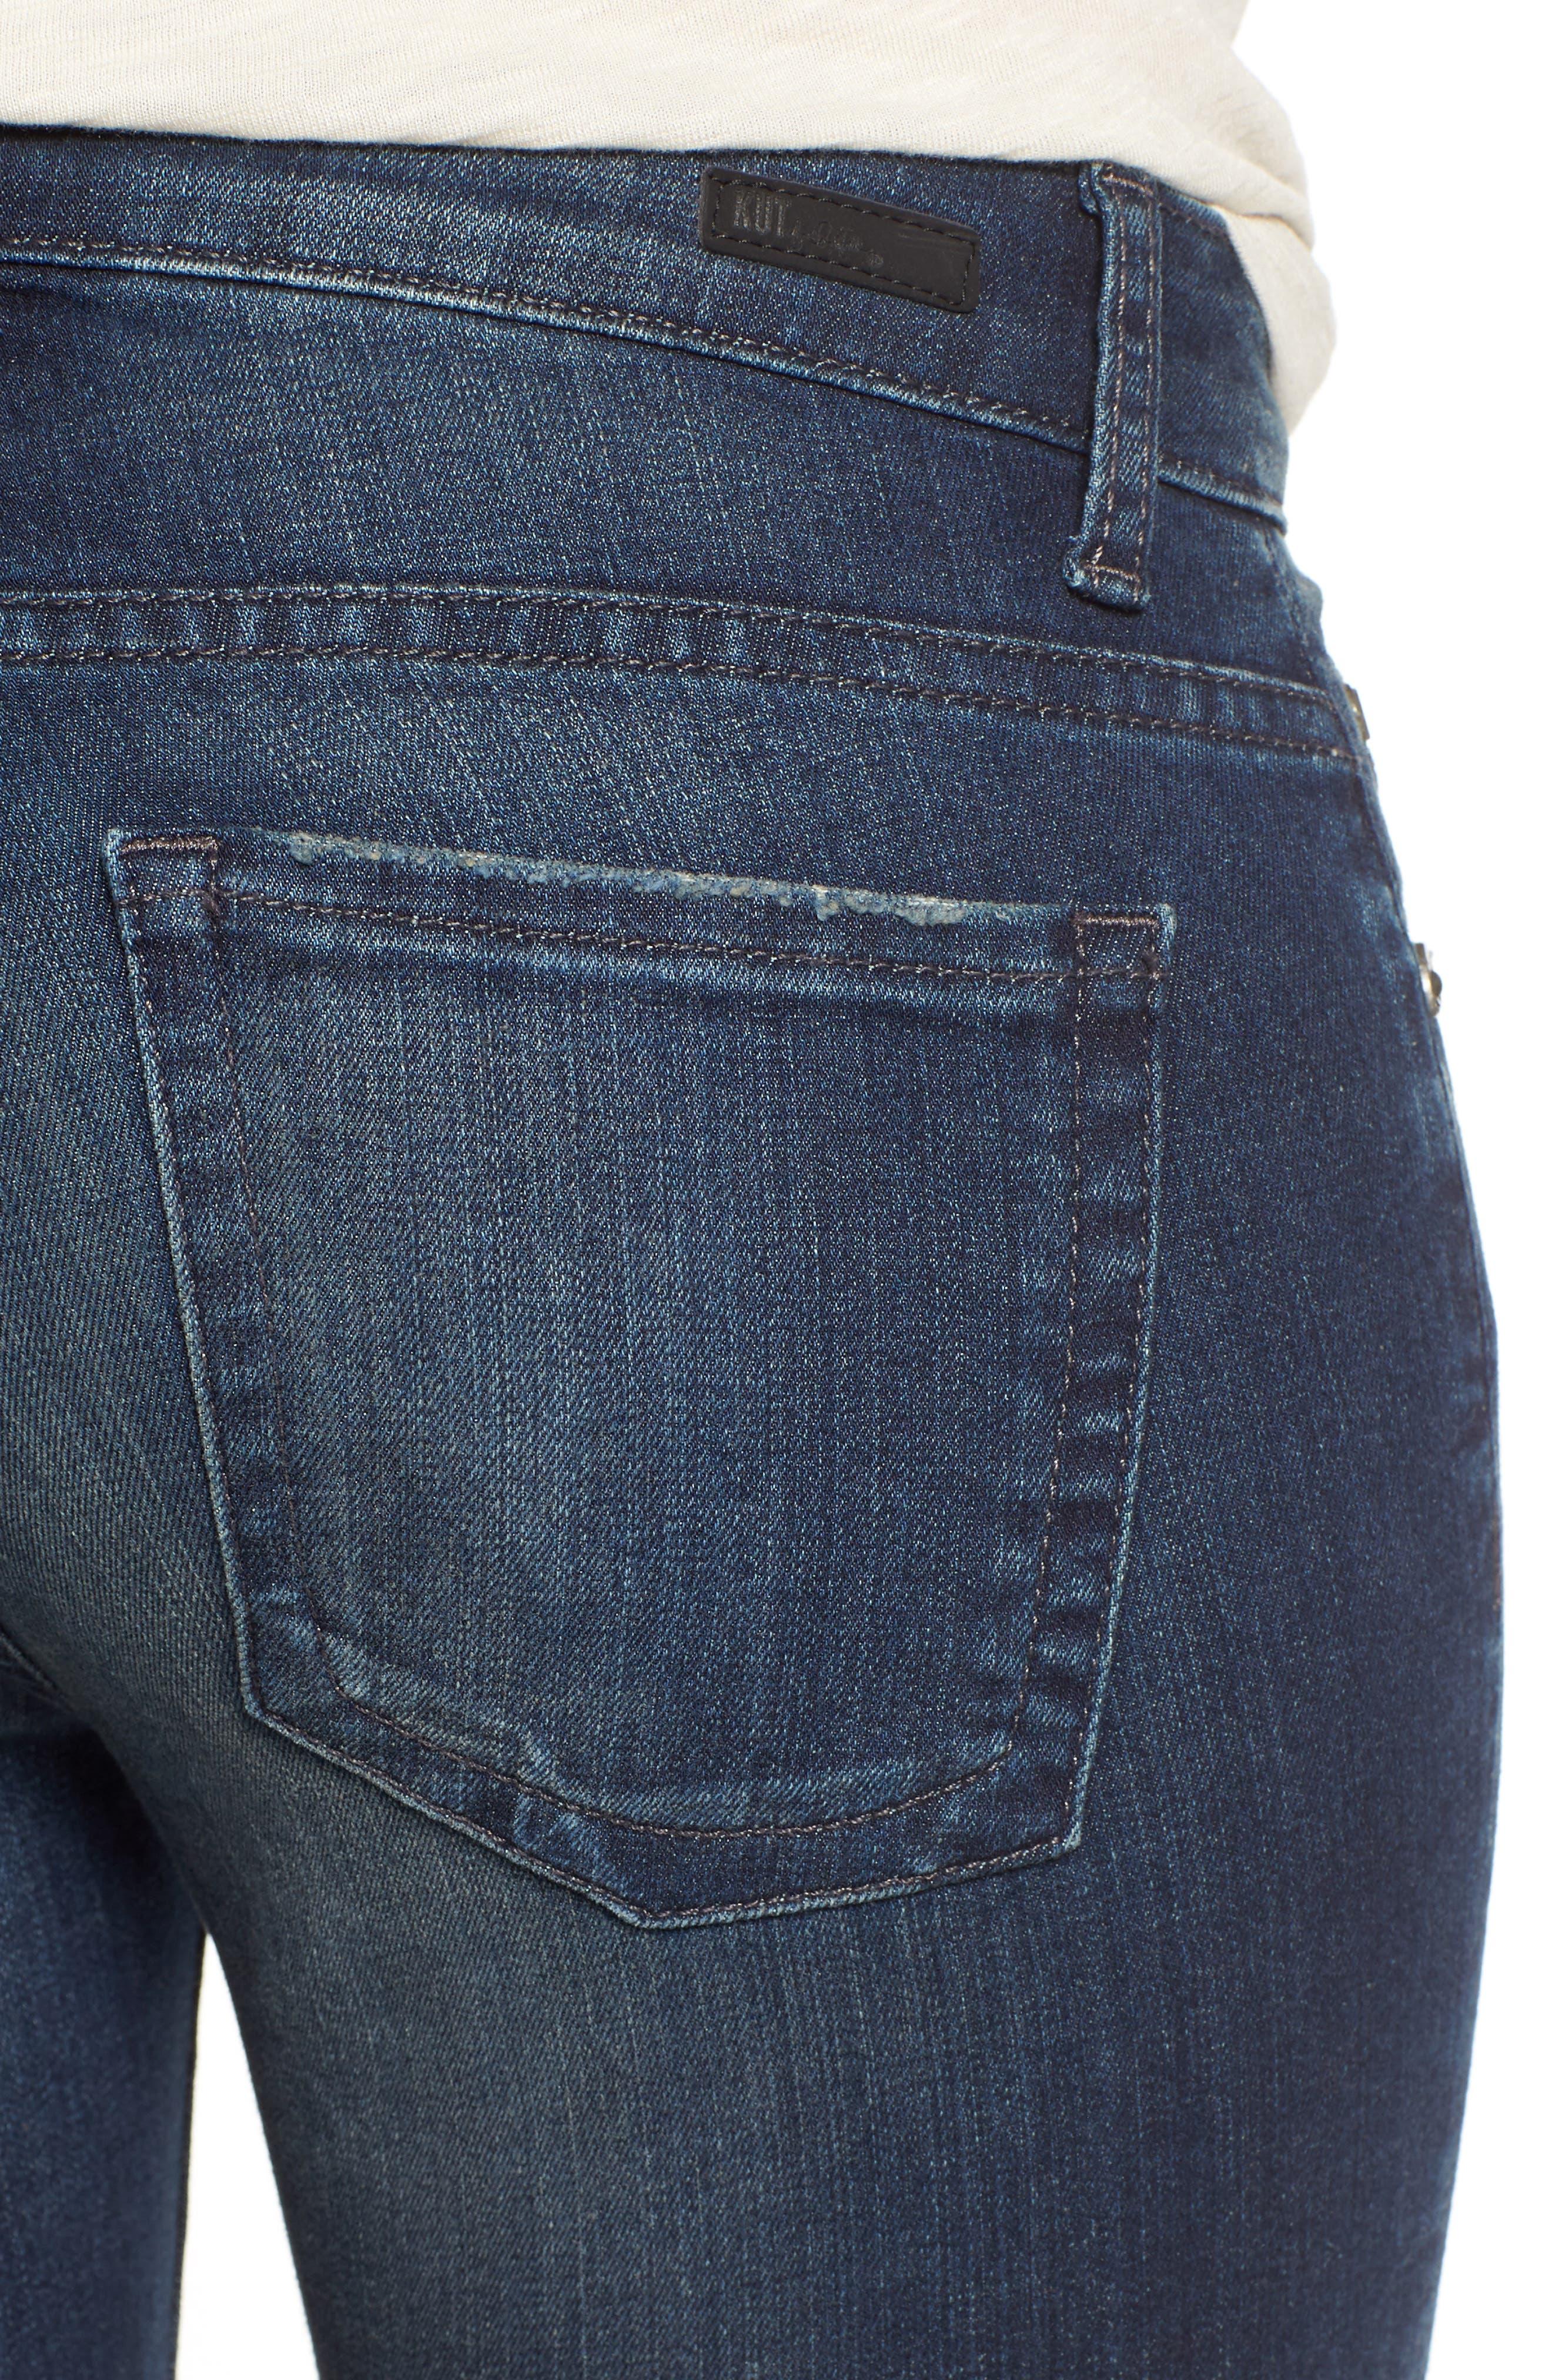 KUT FROM THE KLOTH, 'Catherine' Slim Boyfriend Jeans, Alternate thumbnail 4, color, CAREFULNESS